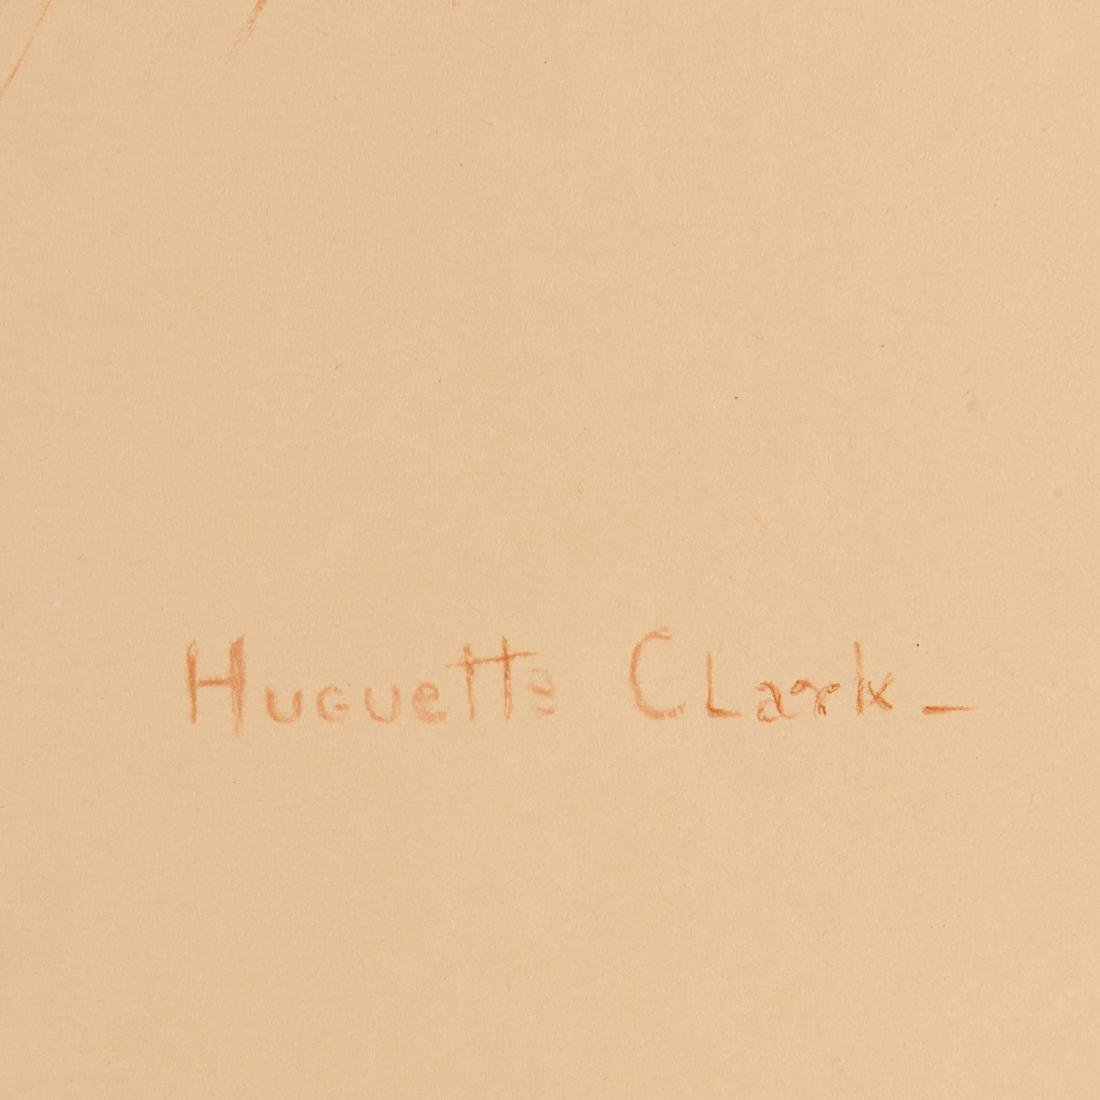 Huguette Clark, (2) prints - 6